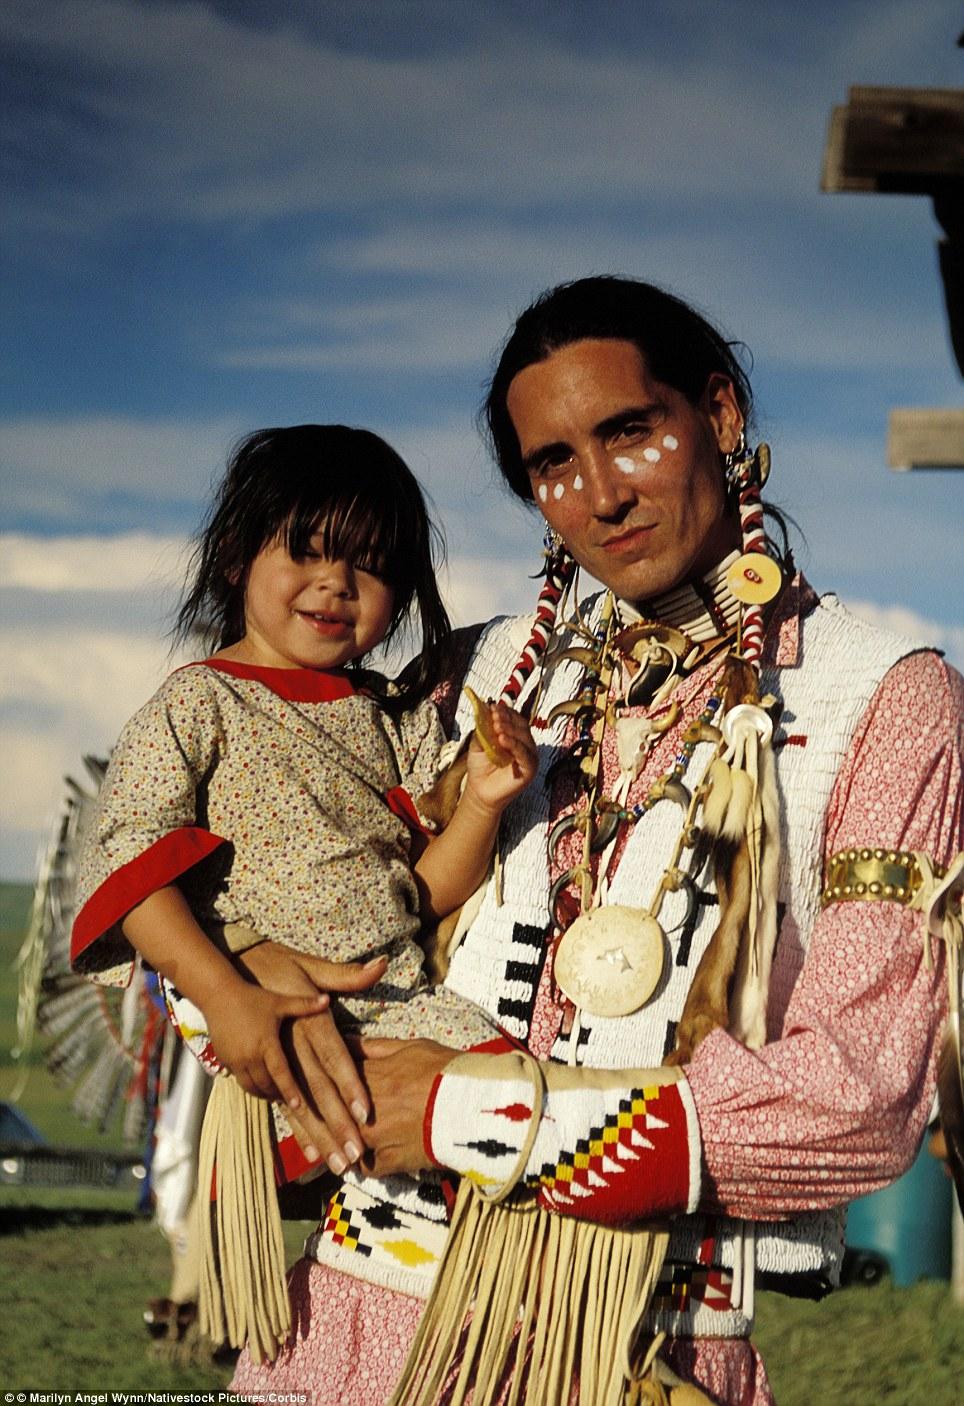 Pine Ridge Indian Reservation, South Dakota, USA --- Steven Garcia with his daughter Cheyenne during the Oglala College powwow on the Pine Ridge Reservation in South Dakota